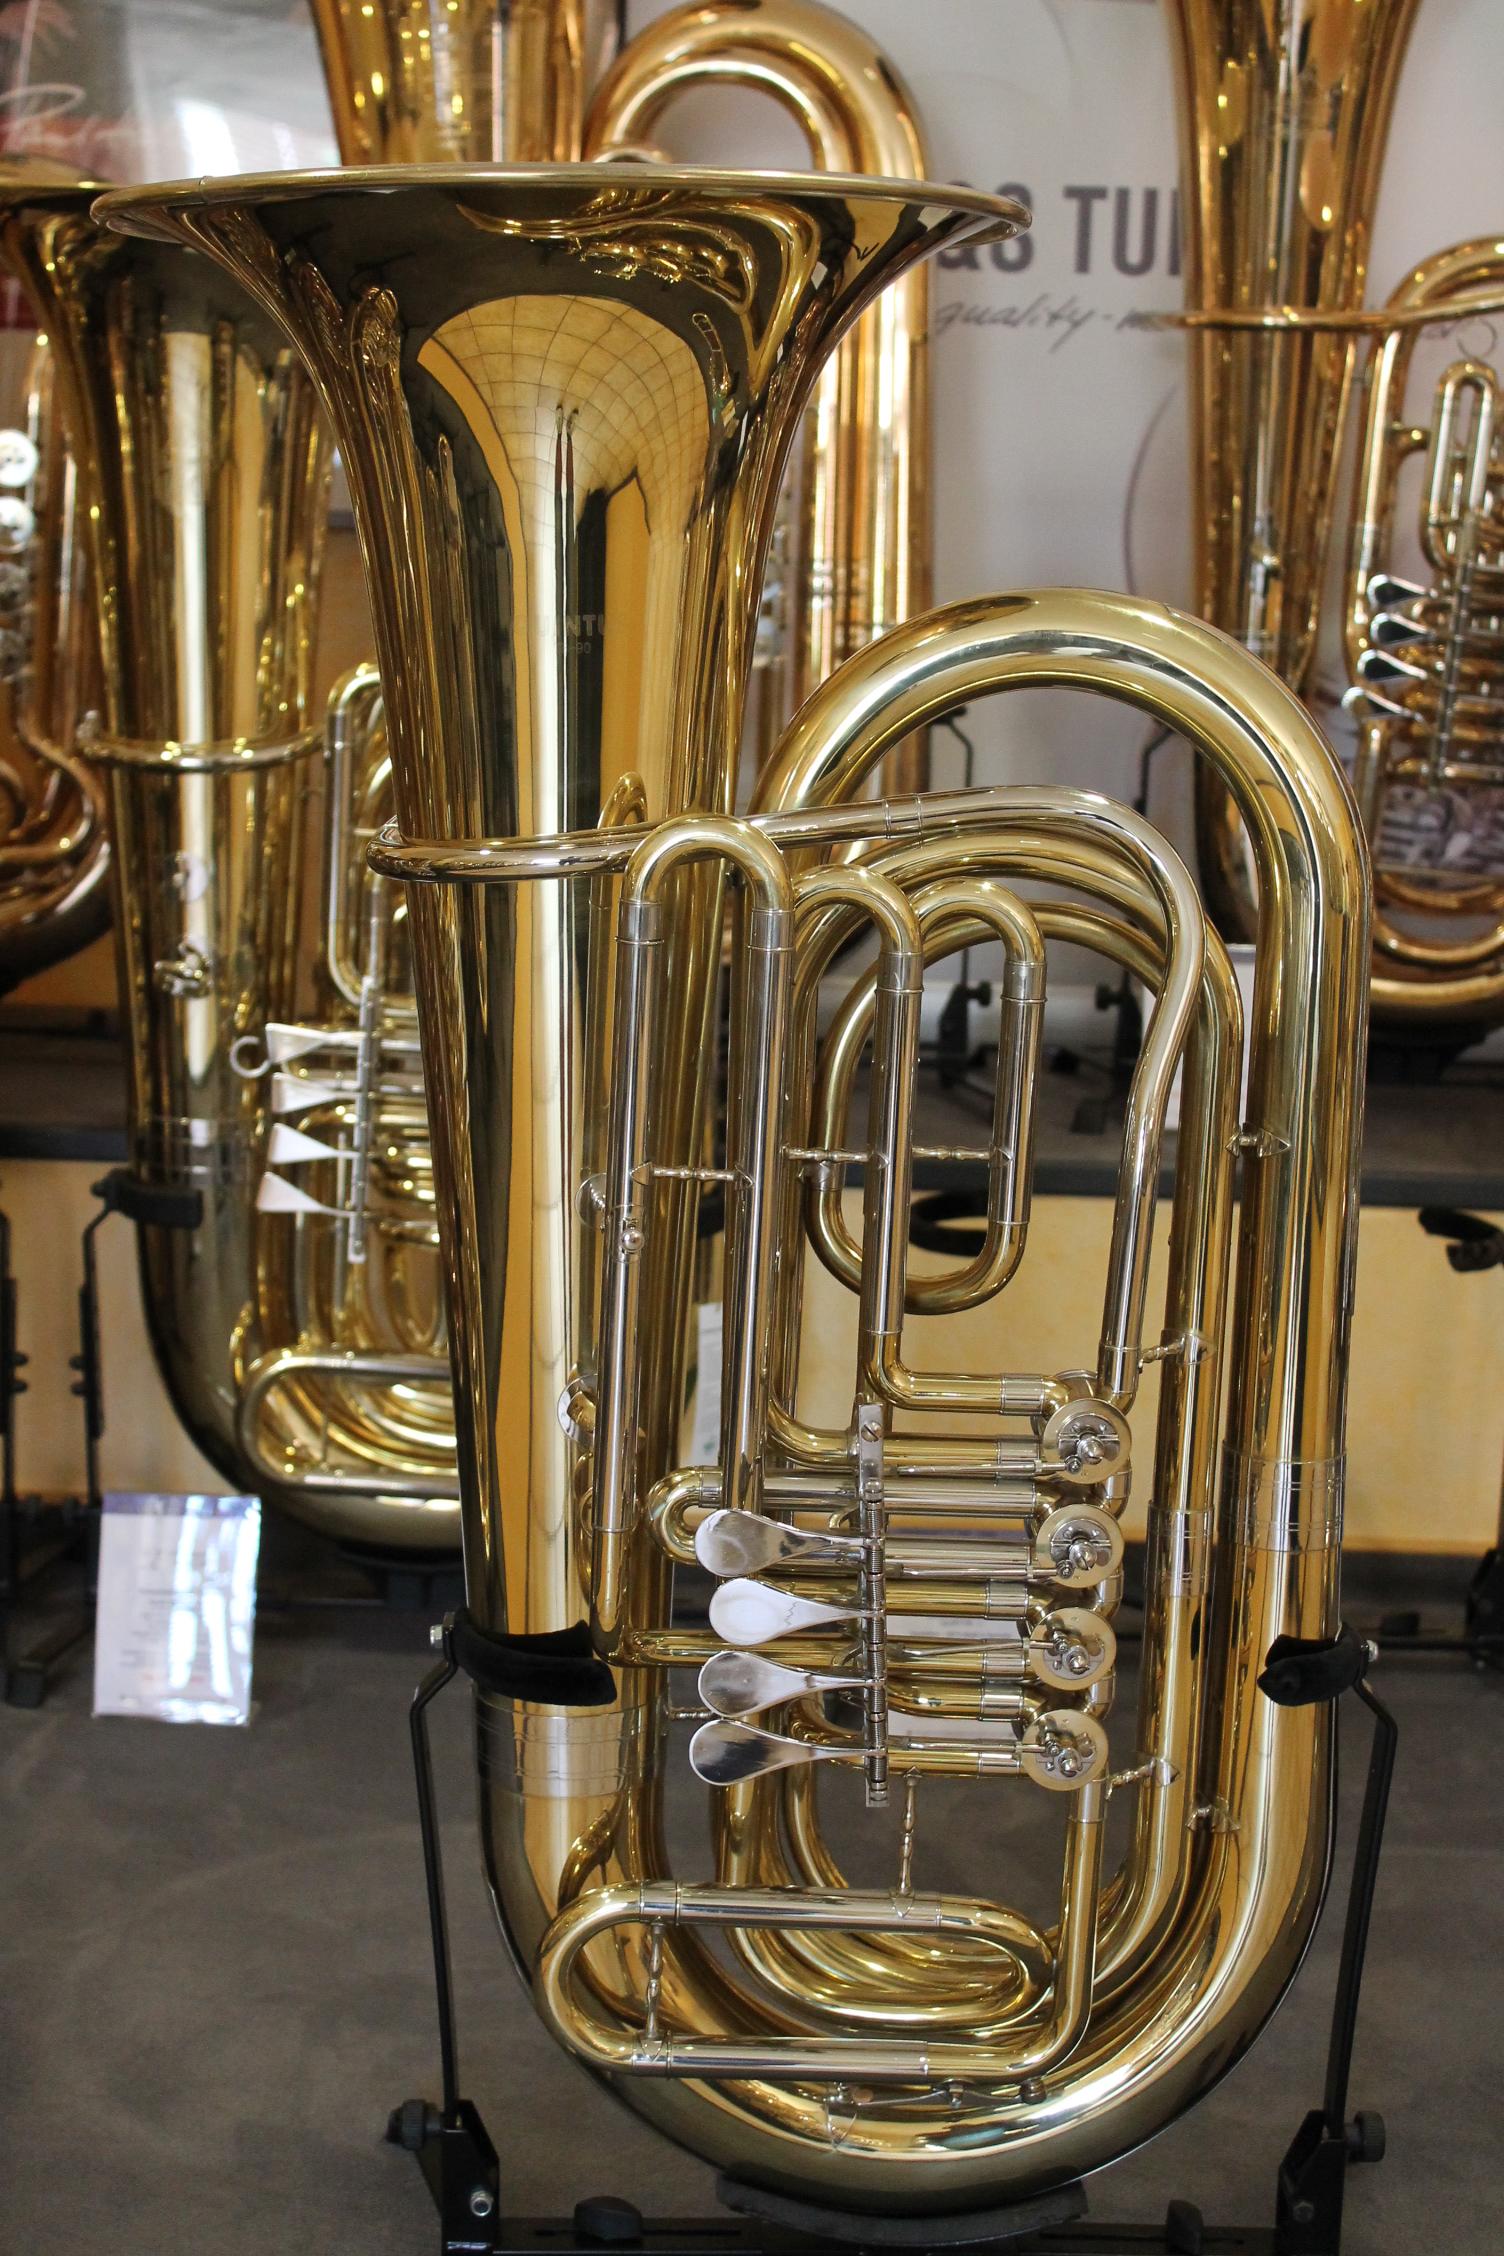 Professioneller Verkauf Bb Kaiserbariton Bariton Silber Euphonium Drehventile Versilbert Musikinstrumente